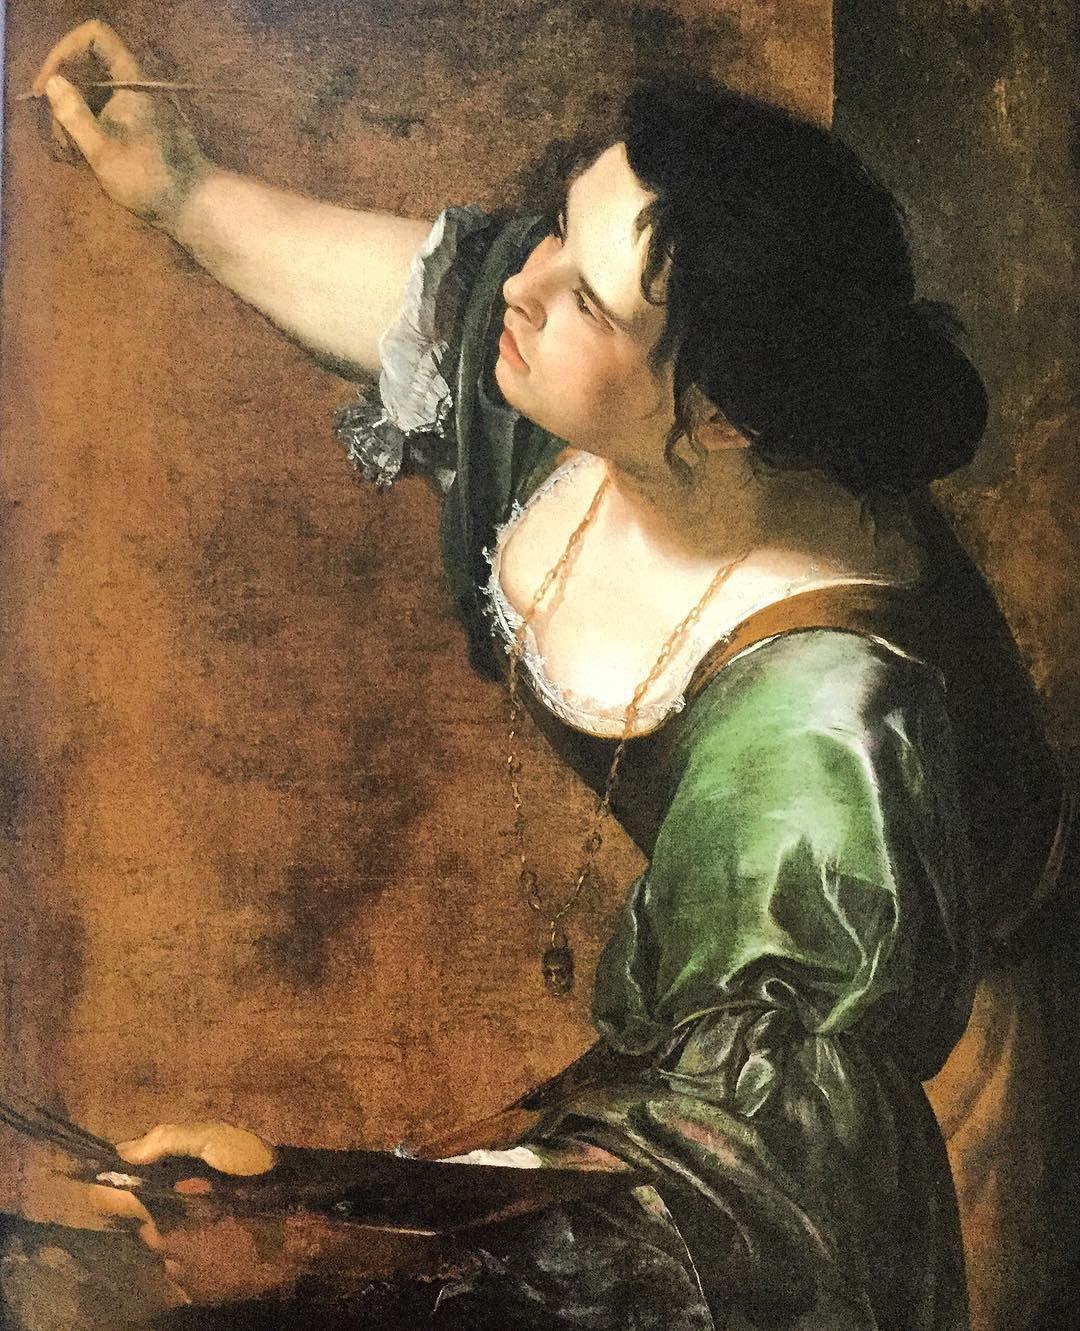 Artemisia Gentileschi 'Self Portrait as the Allegory of